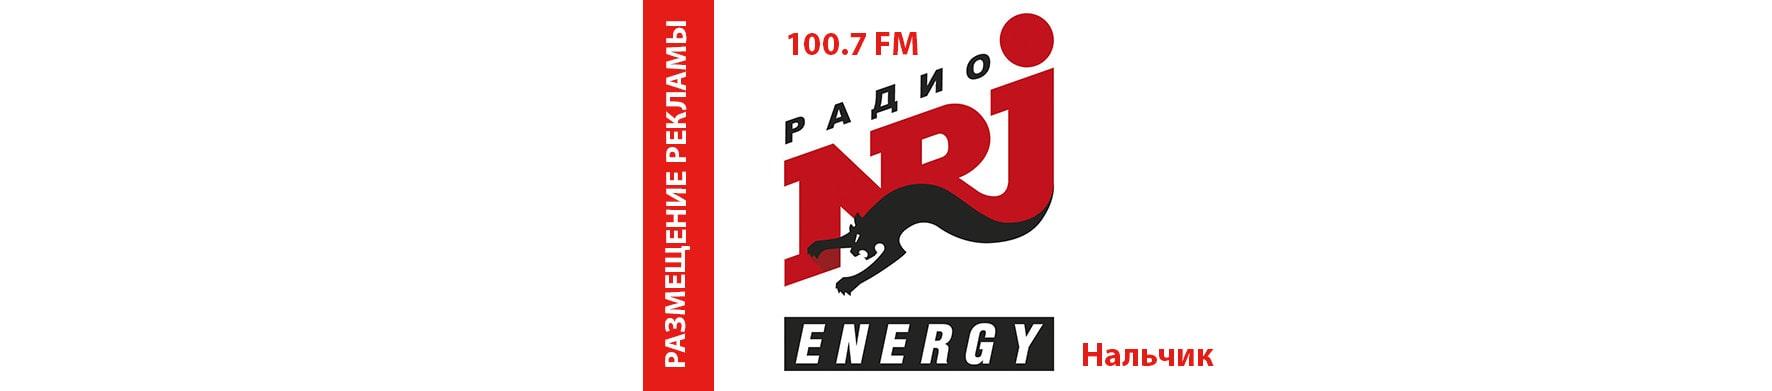 Реклама на радио в Кабардино-Балкарии Energy